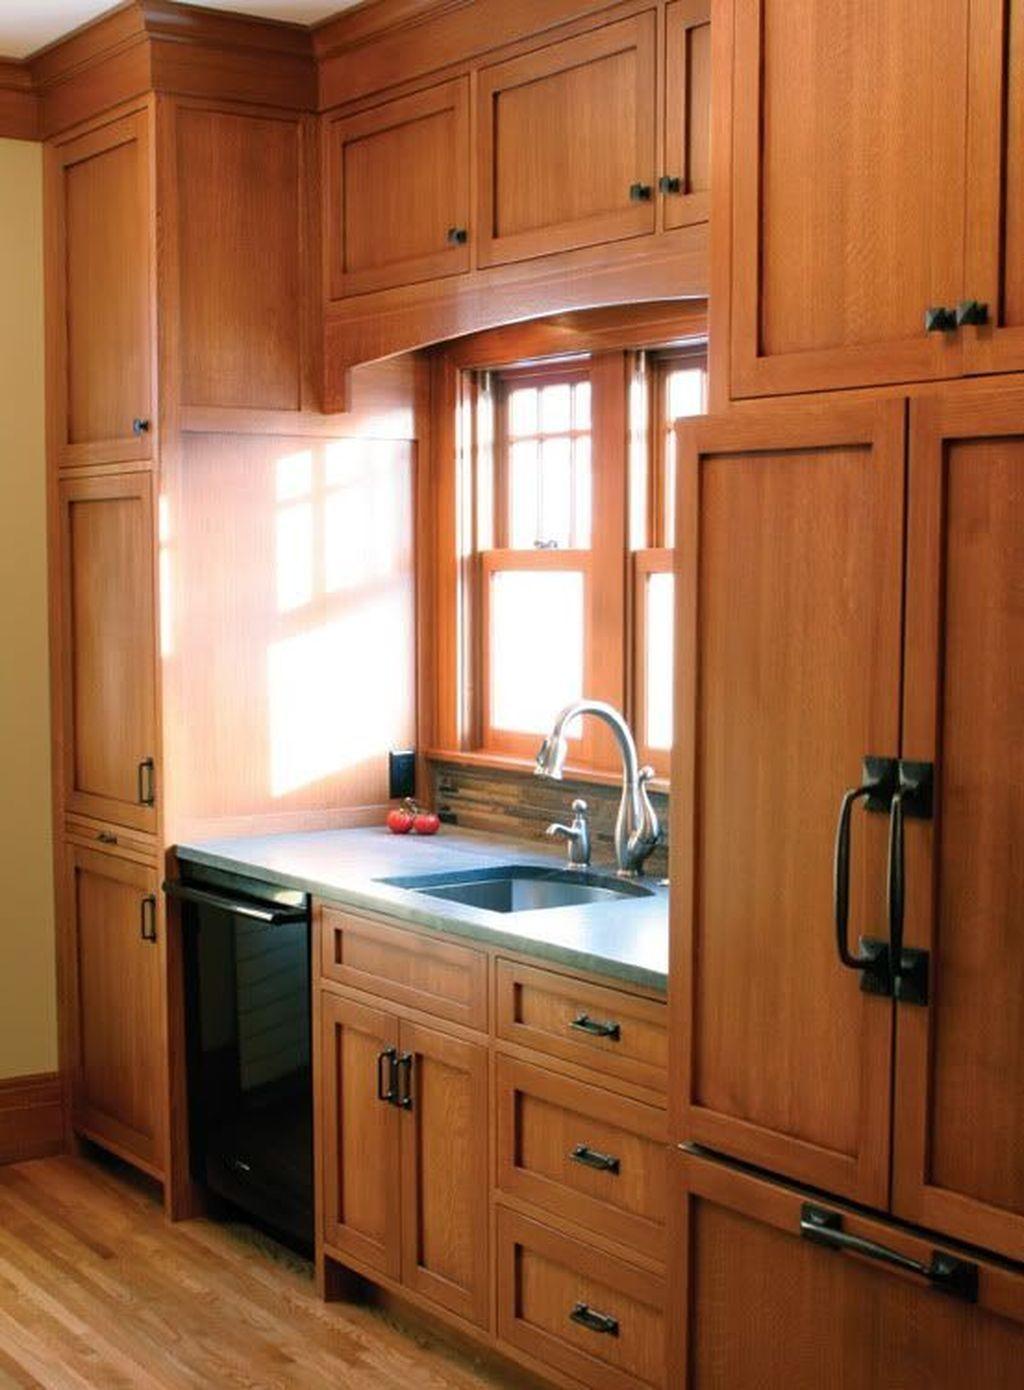 49 Luxurious Farmhouse Style Kitchen Cabinet Design Ideas Kitchen Cabinet Styles Farmhouse Style Kitchen Cabinets Kitchen Design